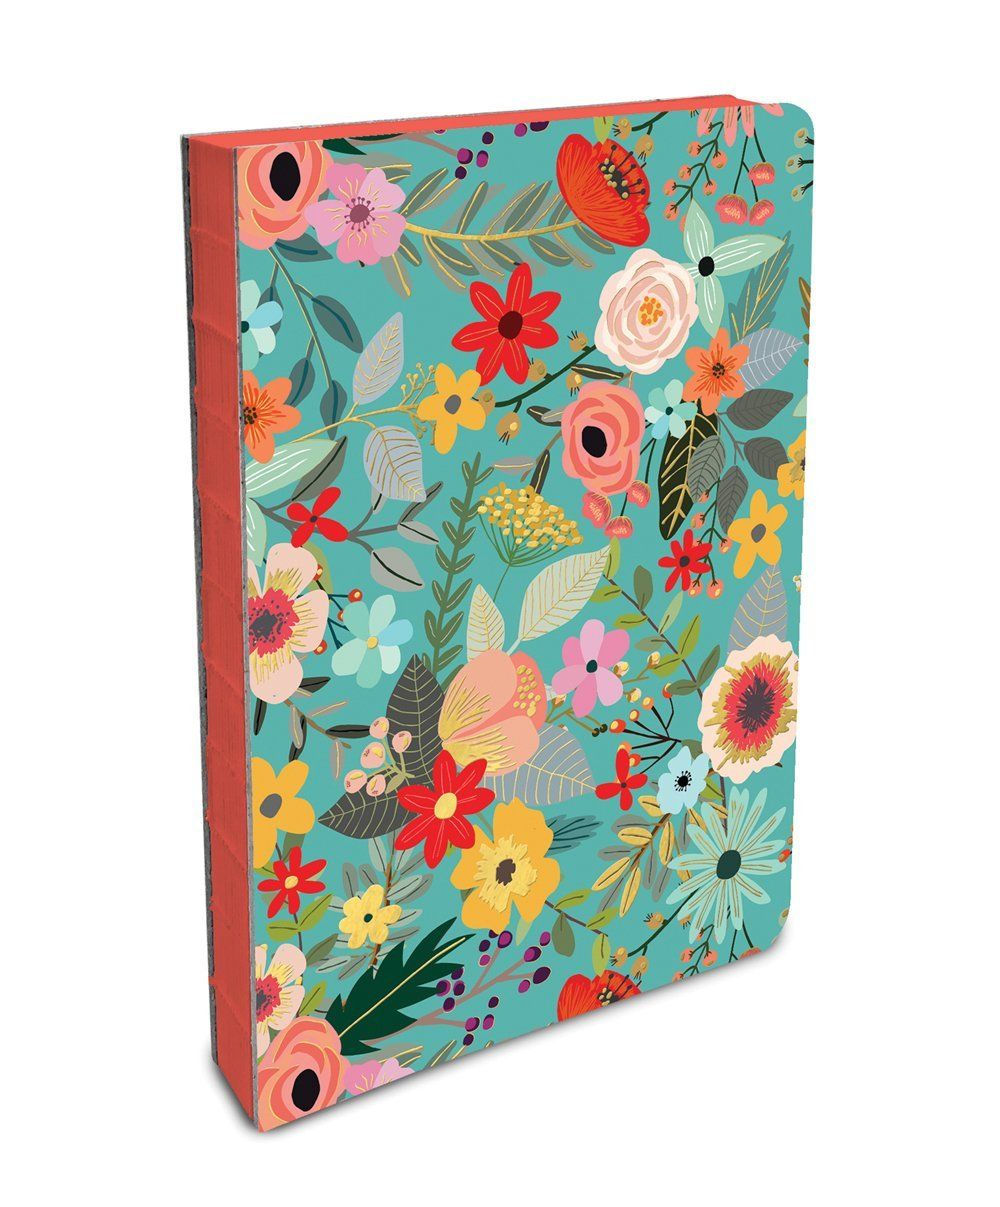 Amazon.com: Coptic-Bound Journal Secret Garden: Orange Circle Studio: Office Products